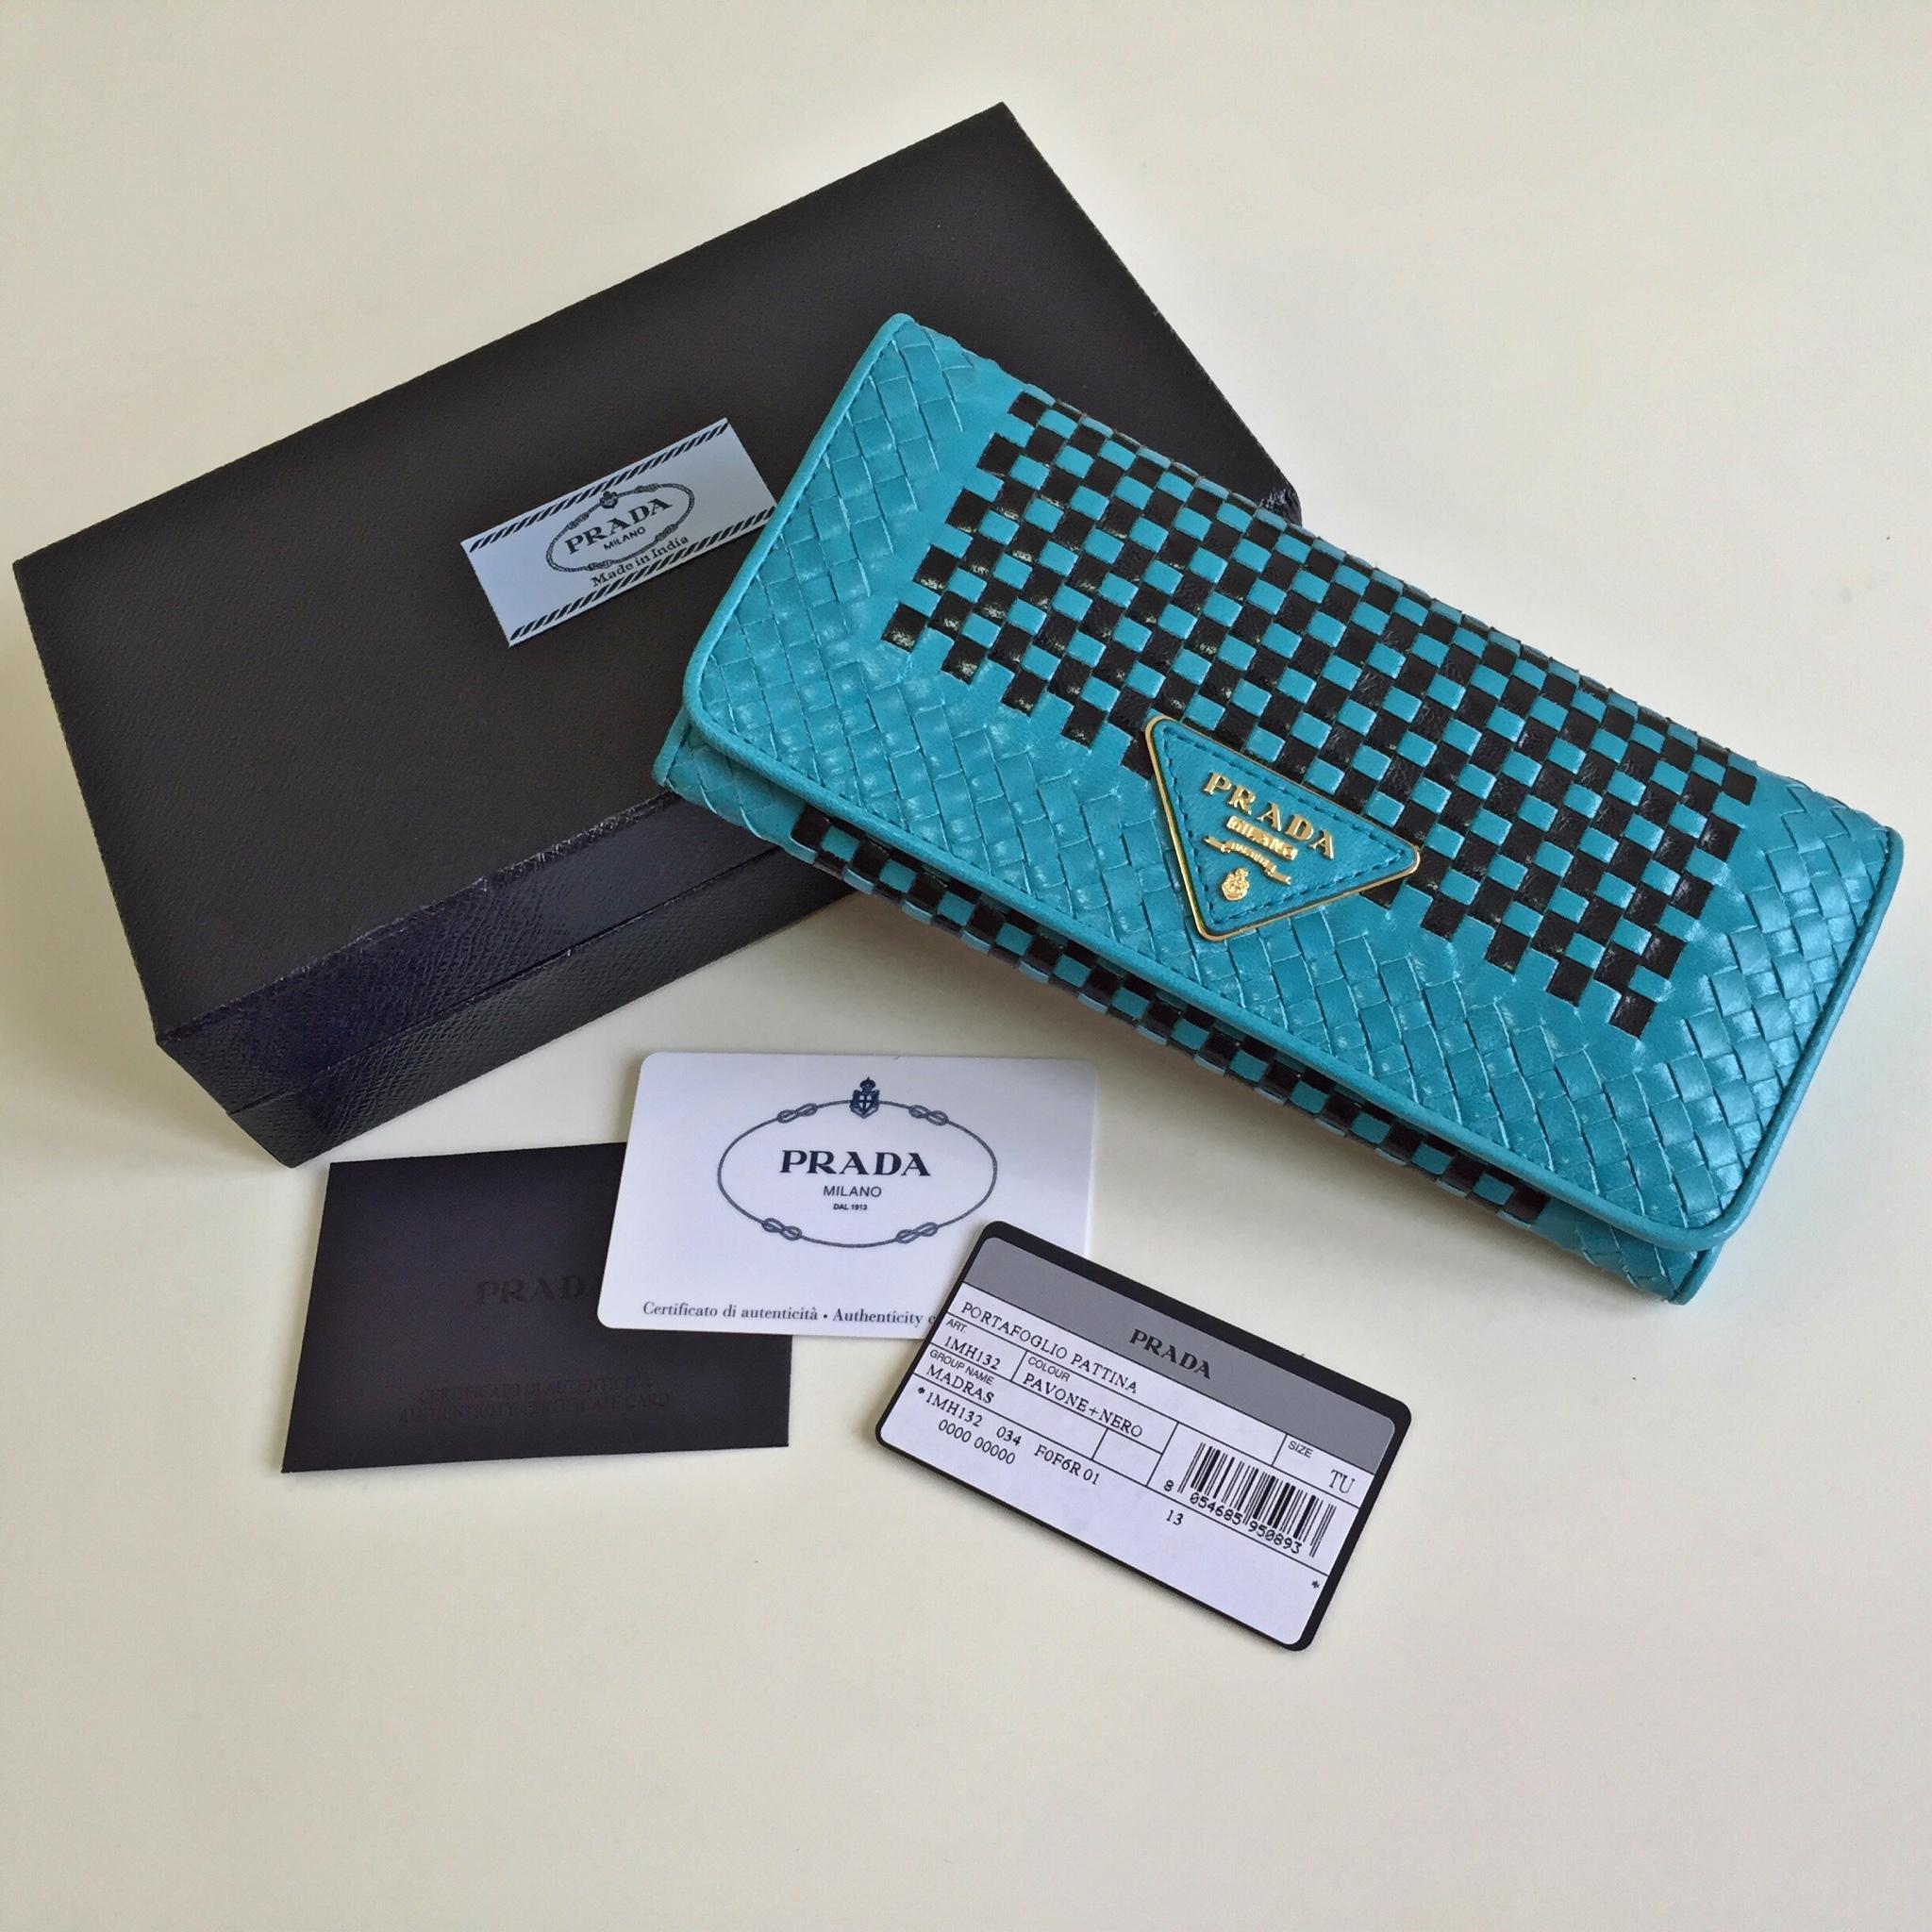 282dcbb3c0b1 PRADA Madras Pavone + Nero Continental Wallet on Storenvy